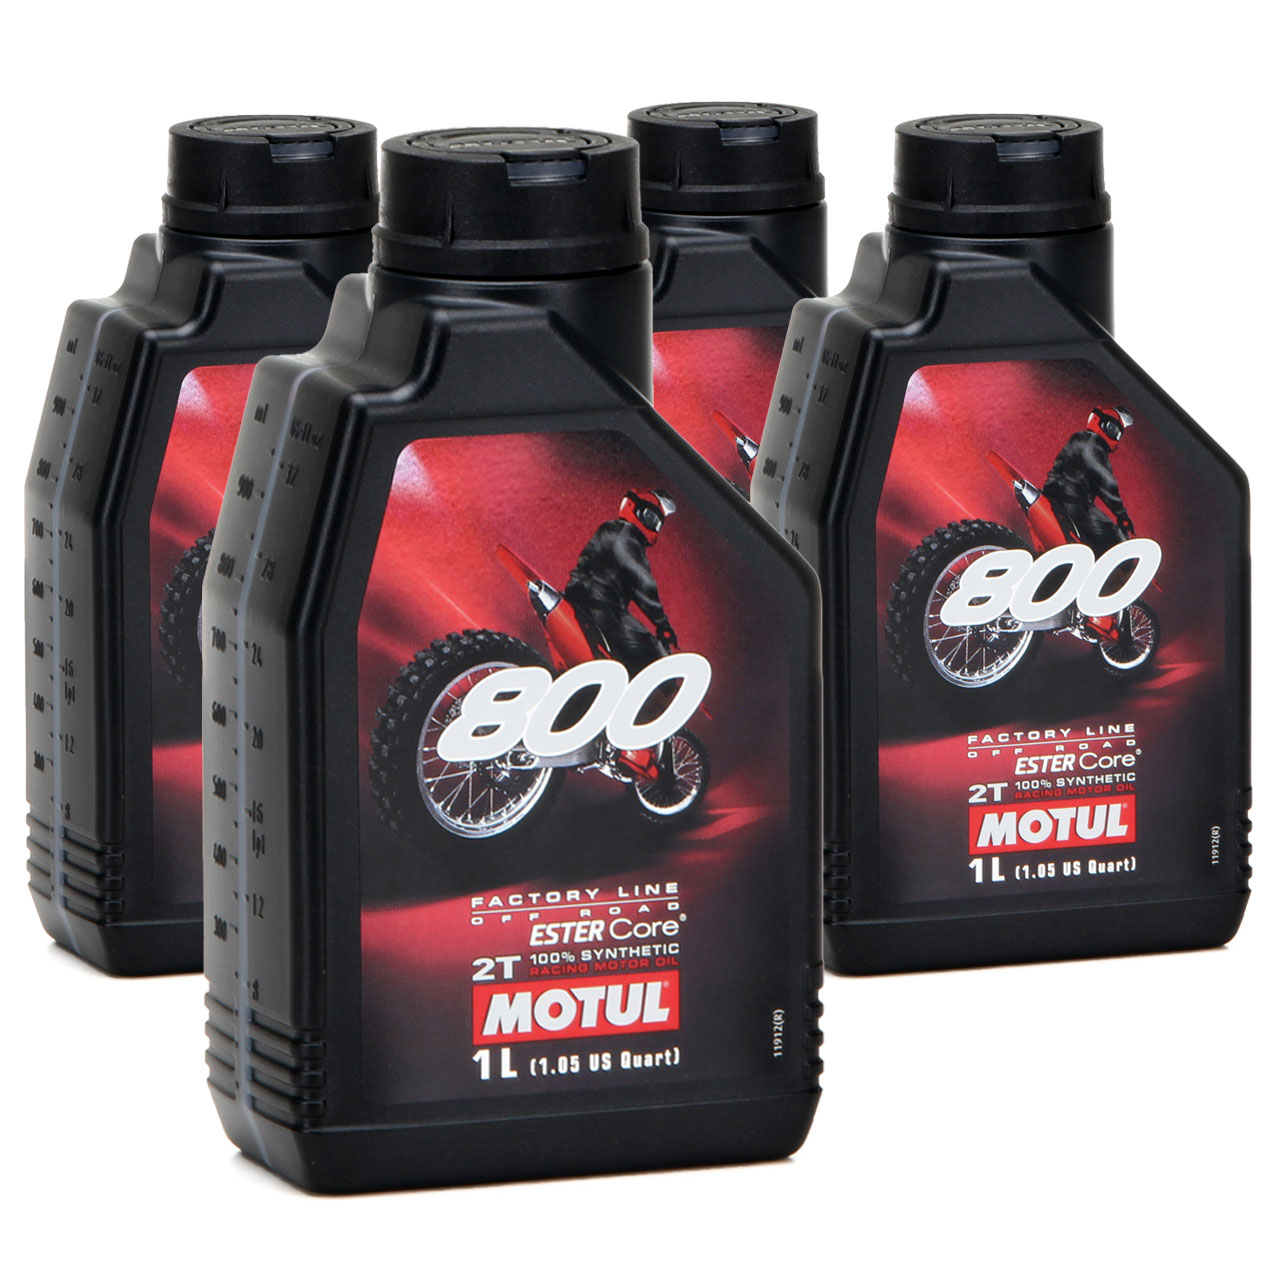 MOTUL 800 2T 2-TAKT Motoröl Öl OFF ROAD Factory Line ESTER Core - 4L 4 Liter